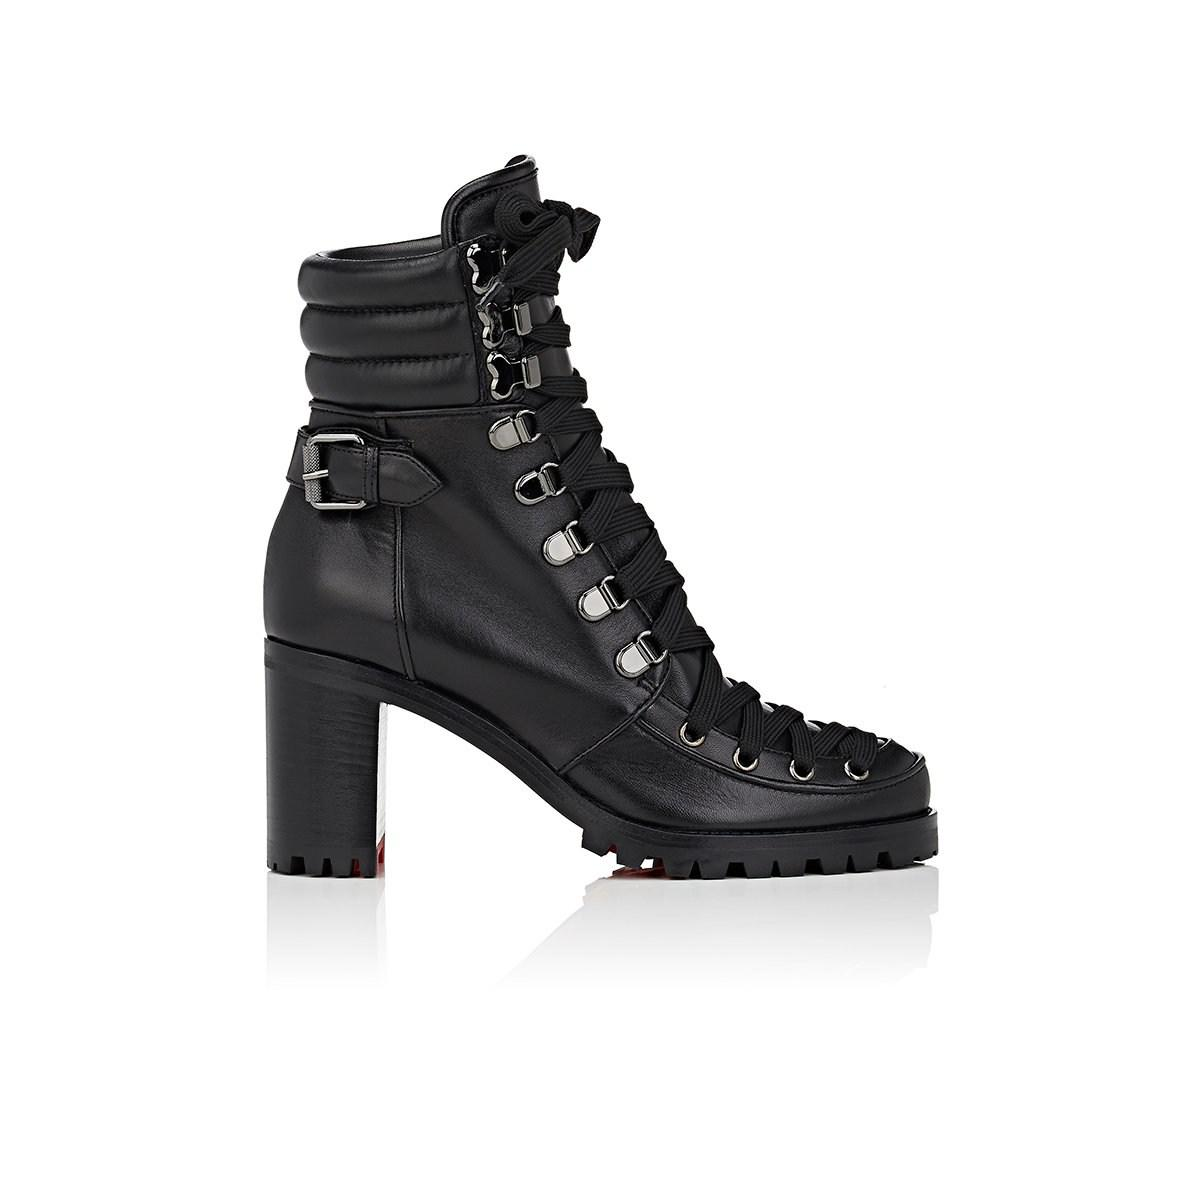 8496ef1e982b ... switzerland christian louboutin. womens black who runs leather ankle  boots 07edb b44fb ...